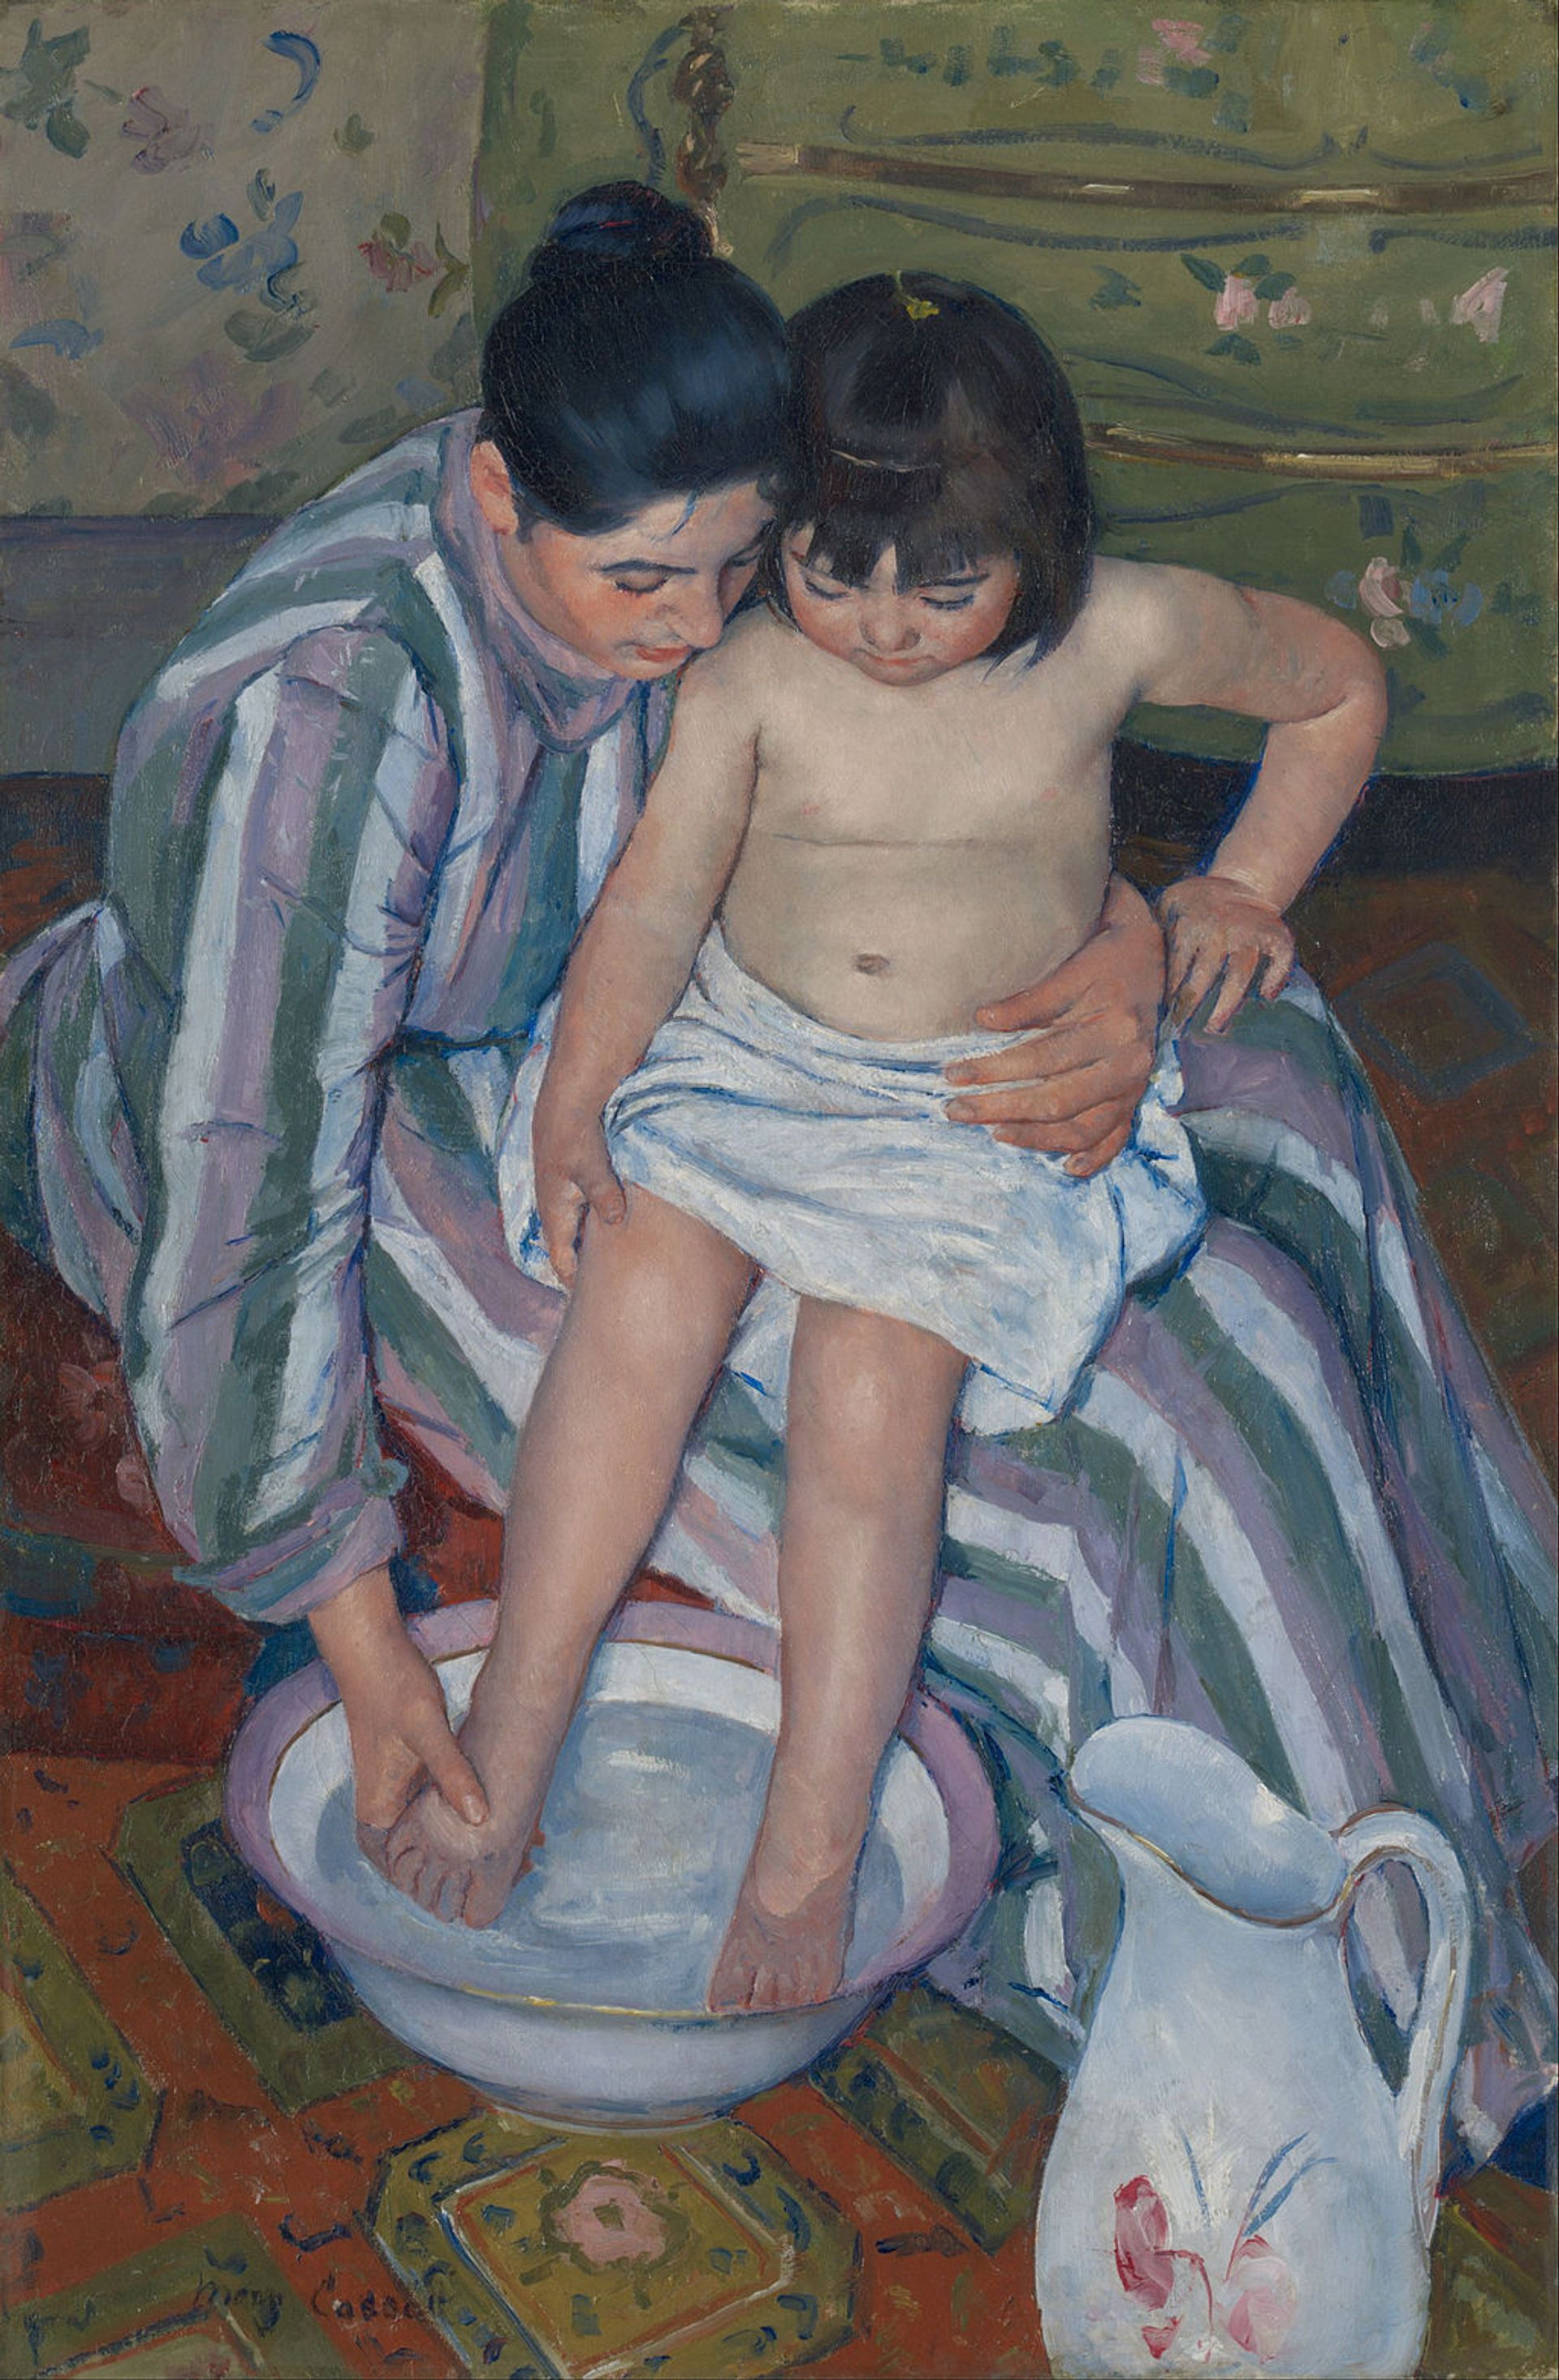 Mary Cassatt's The Child's Bath,  (1893)